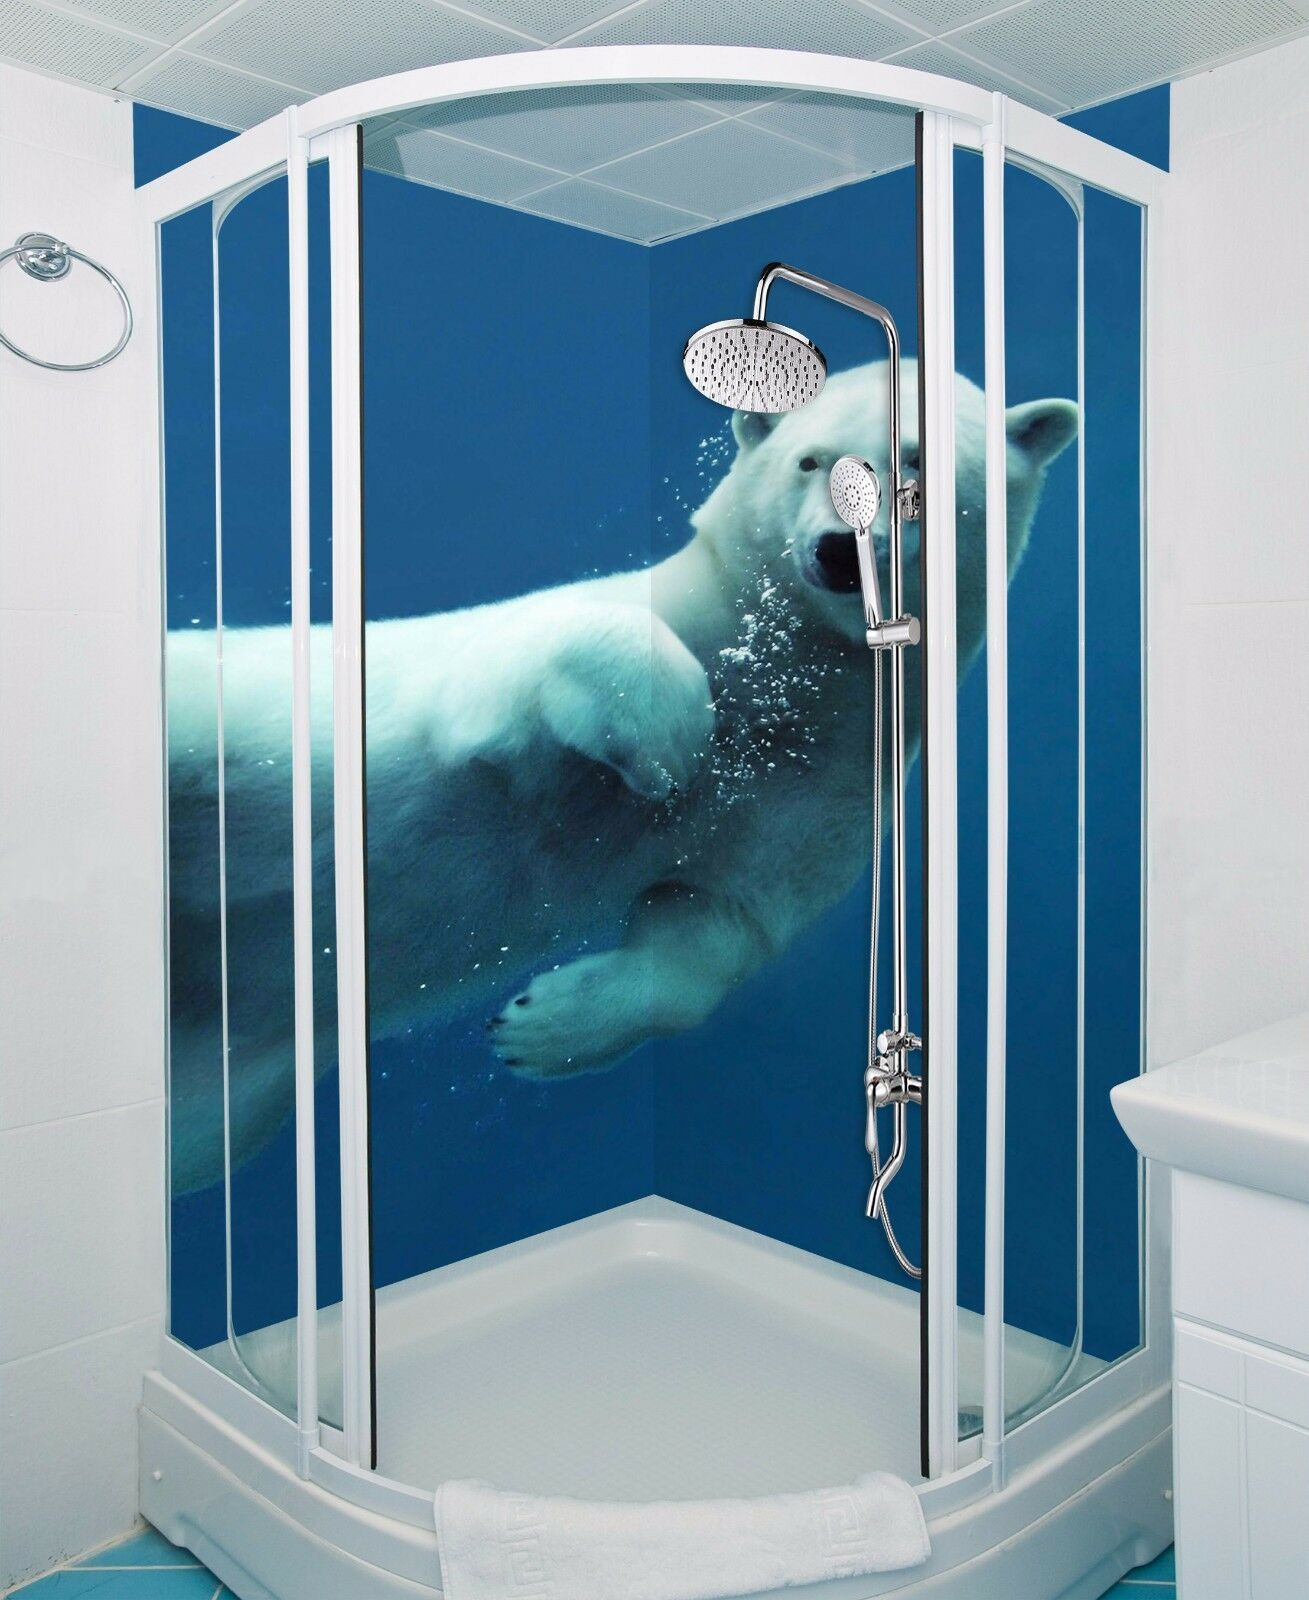 3D Ocean bear 5586 WallPaper Bathroom Print Decal Wall Deco AJ WALLPAPER UK